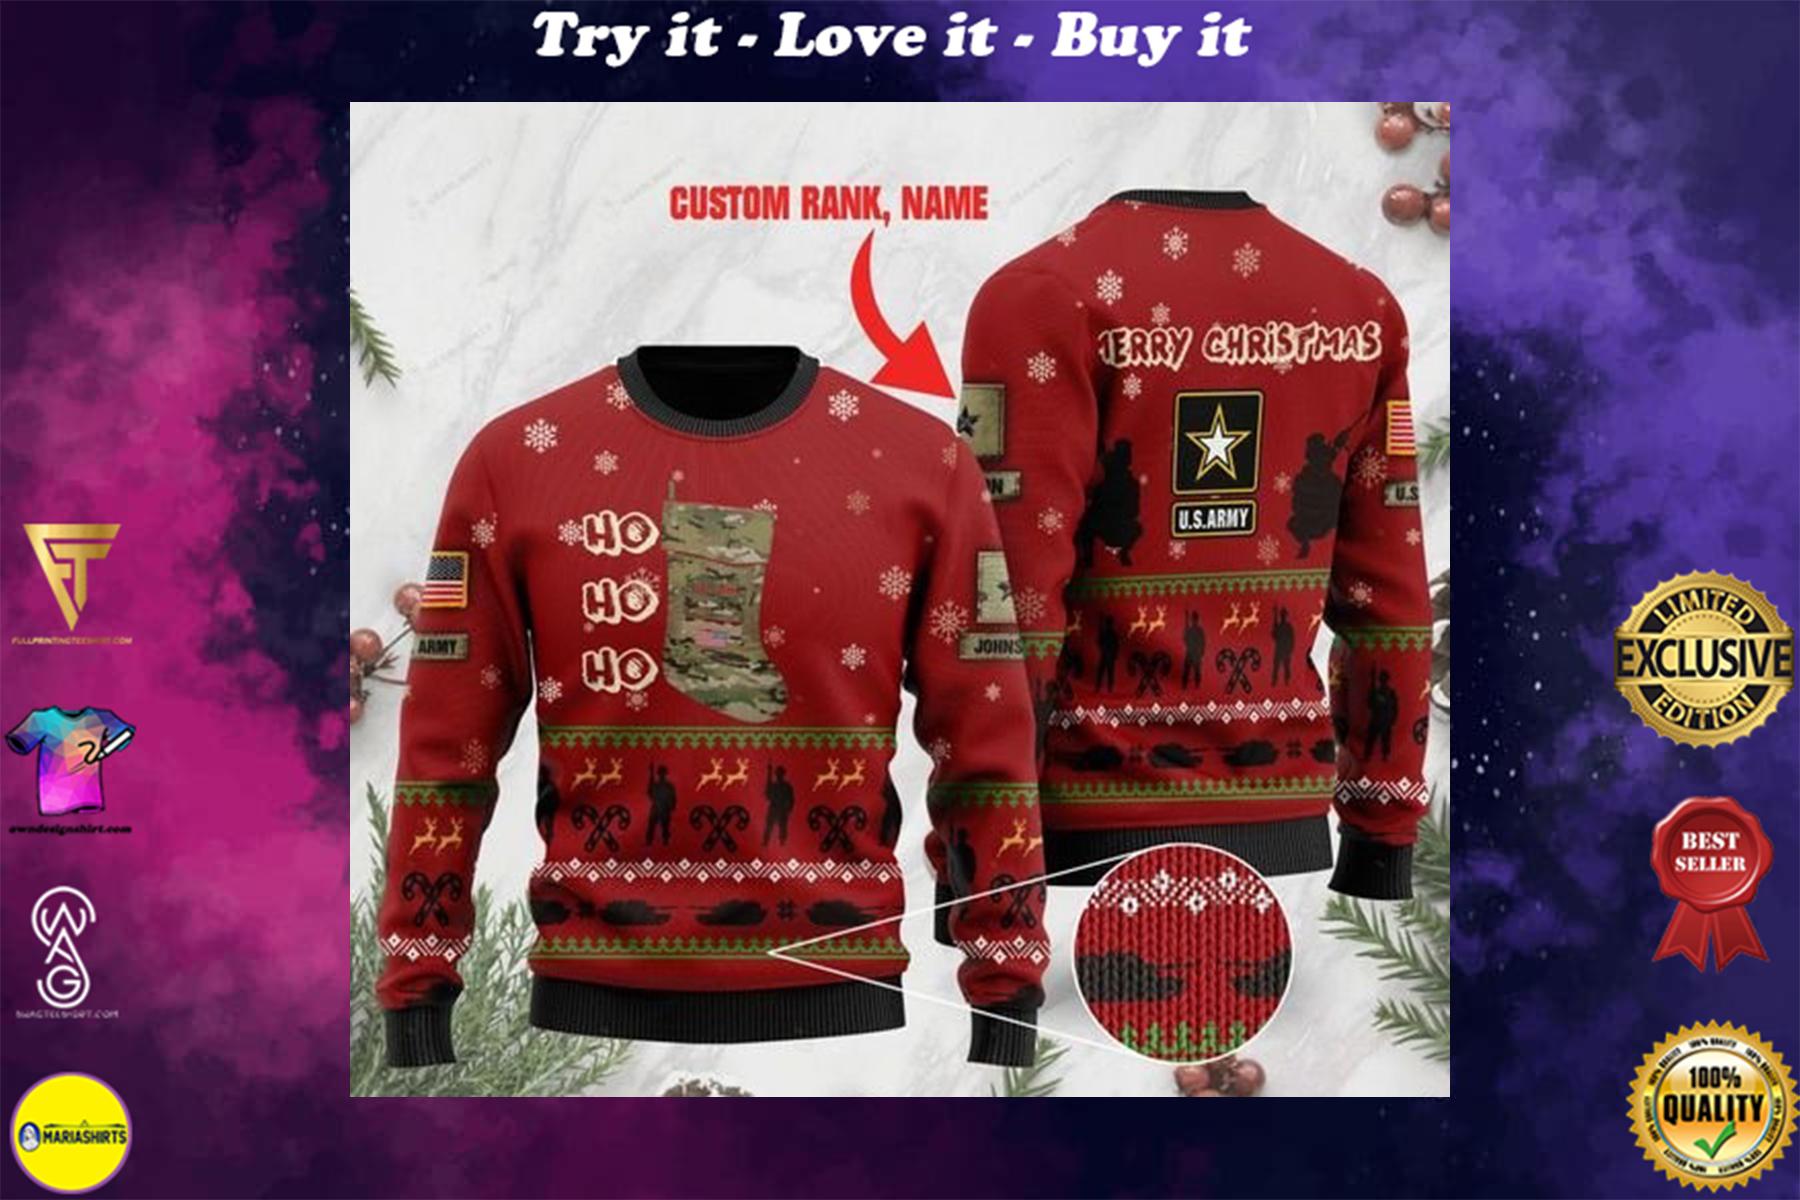 custom rank and name us army ho ho ho christmas time full printing ugly sweater